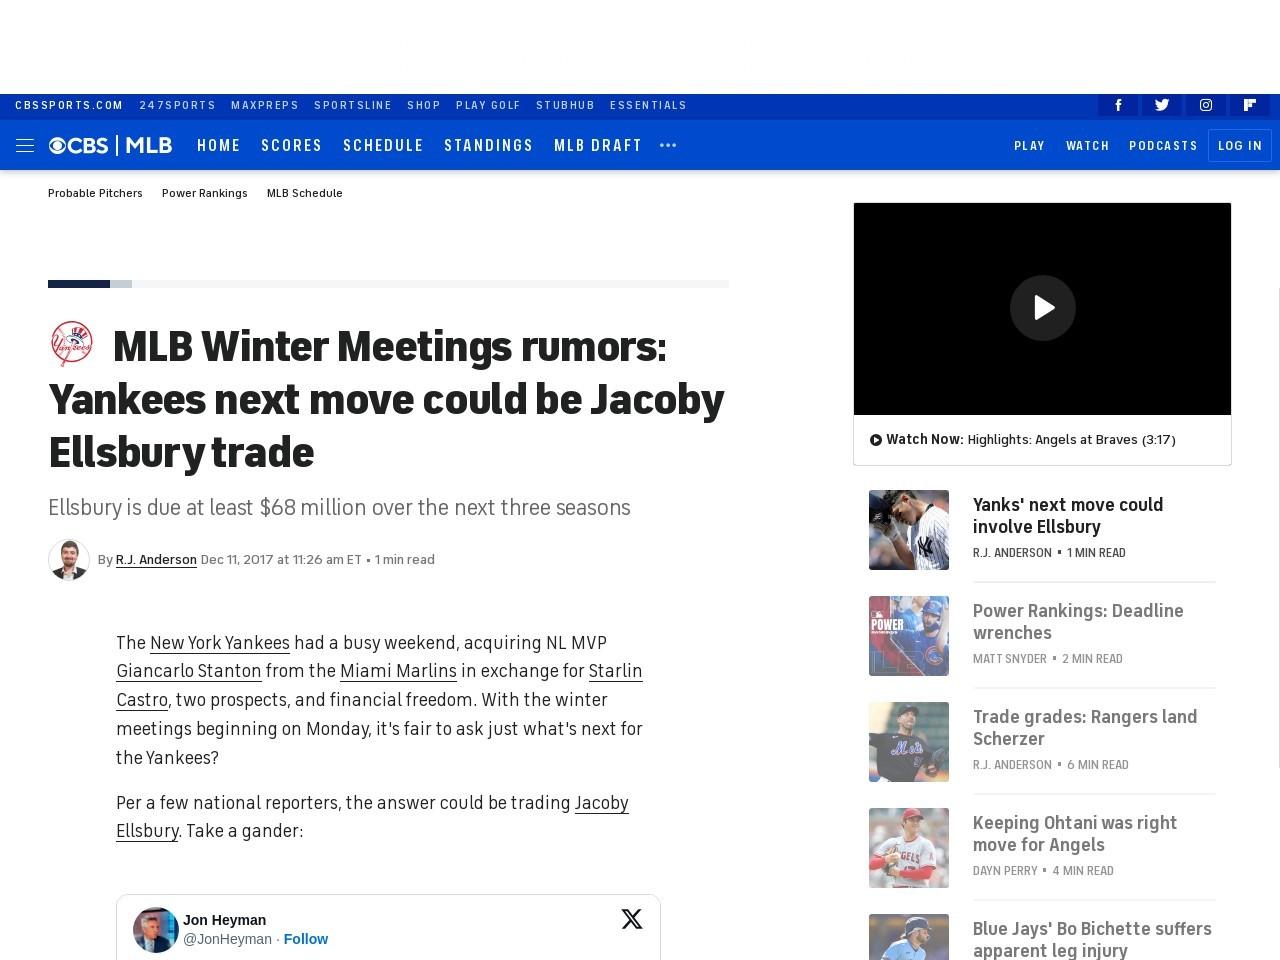 MLB Winter Meetings rumors: Yankees next move could be Jacoby Ellsbury trade